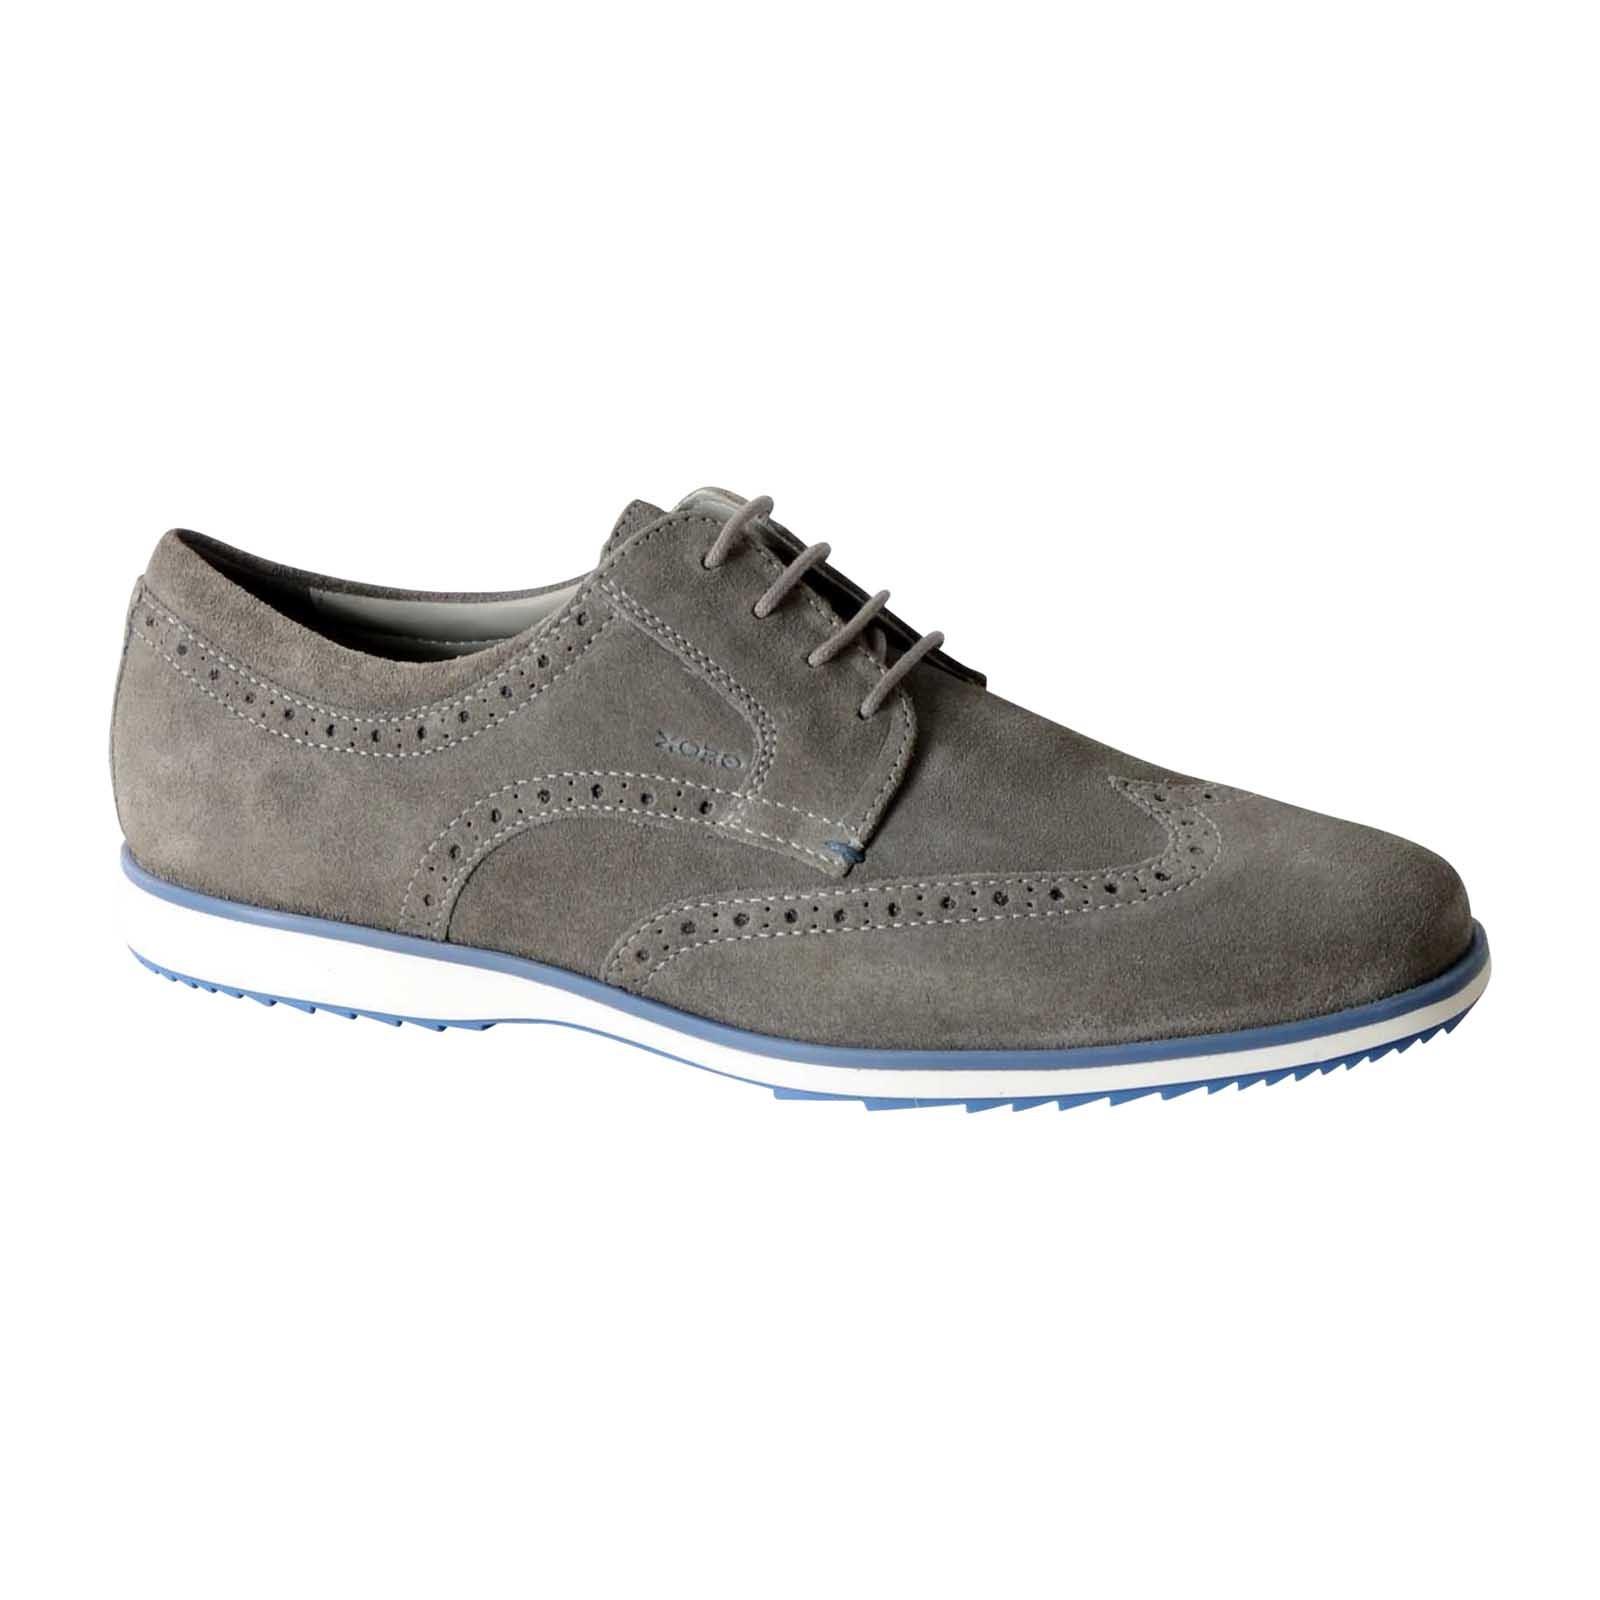 Chaussure-Geox-U-BLAINEY-A-SUEDE miniature 8